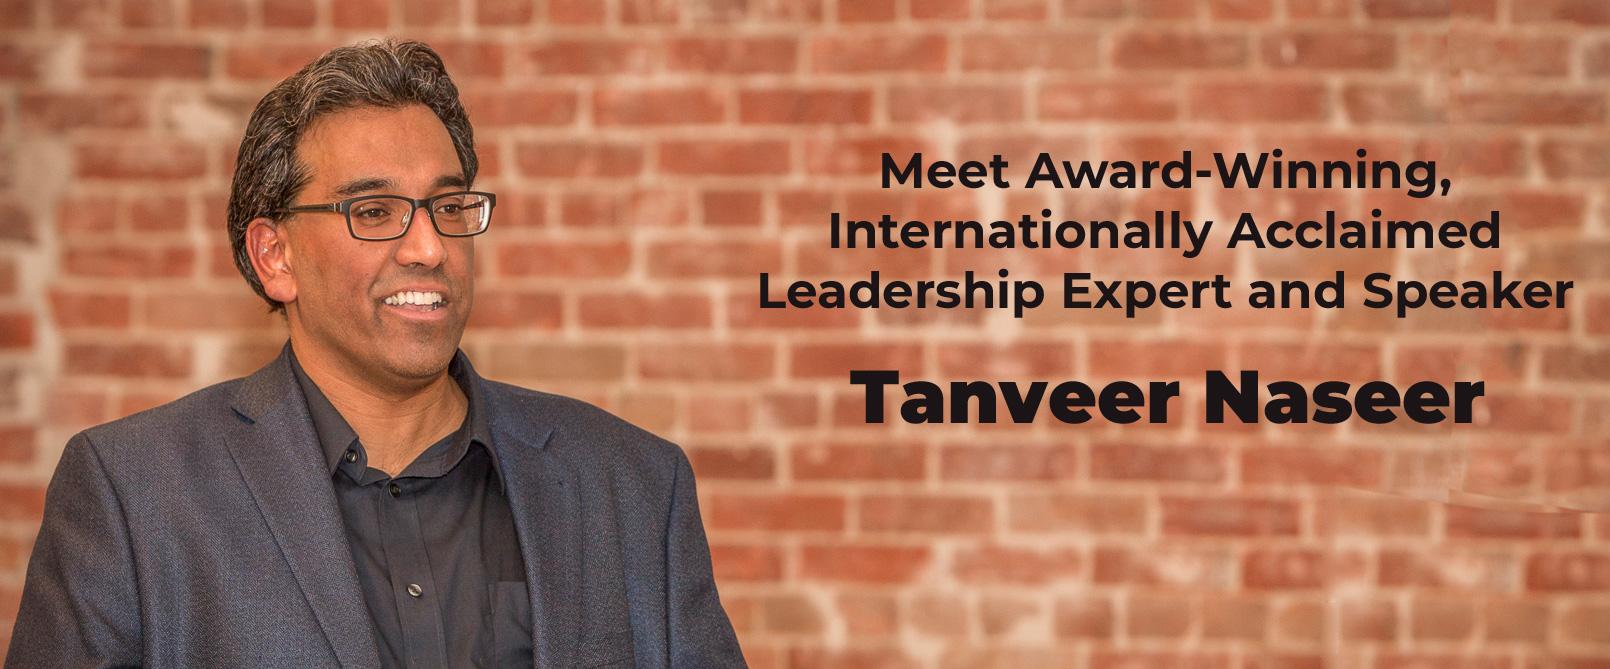 Tanveer Naseer About Page Image